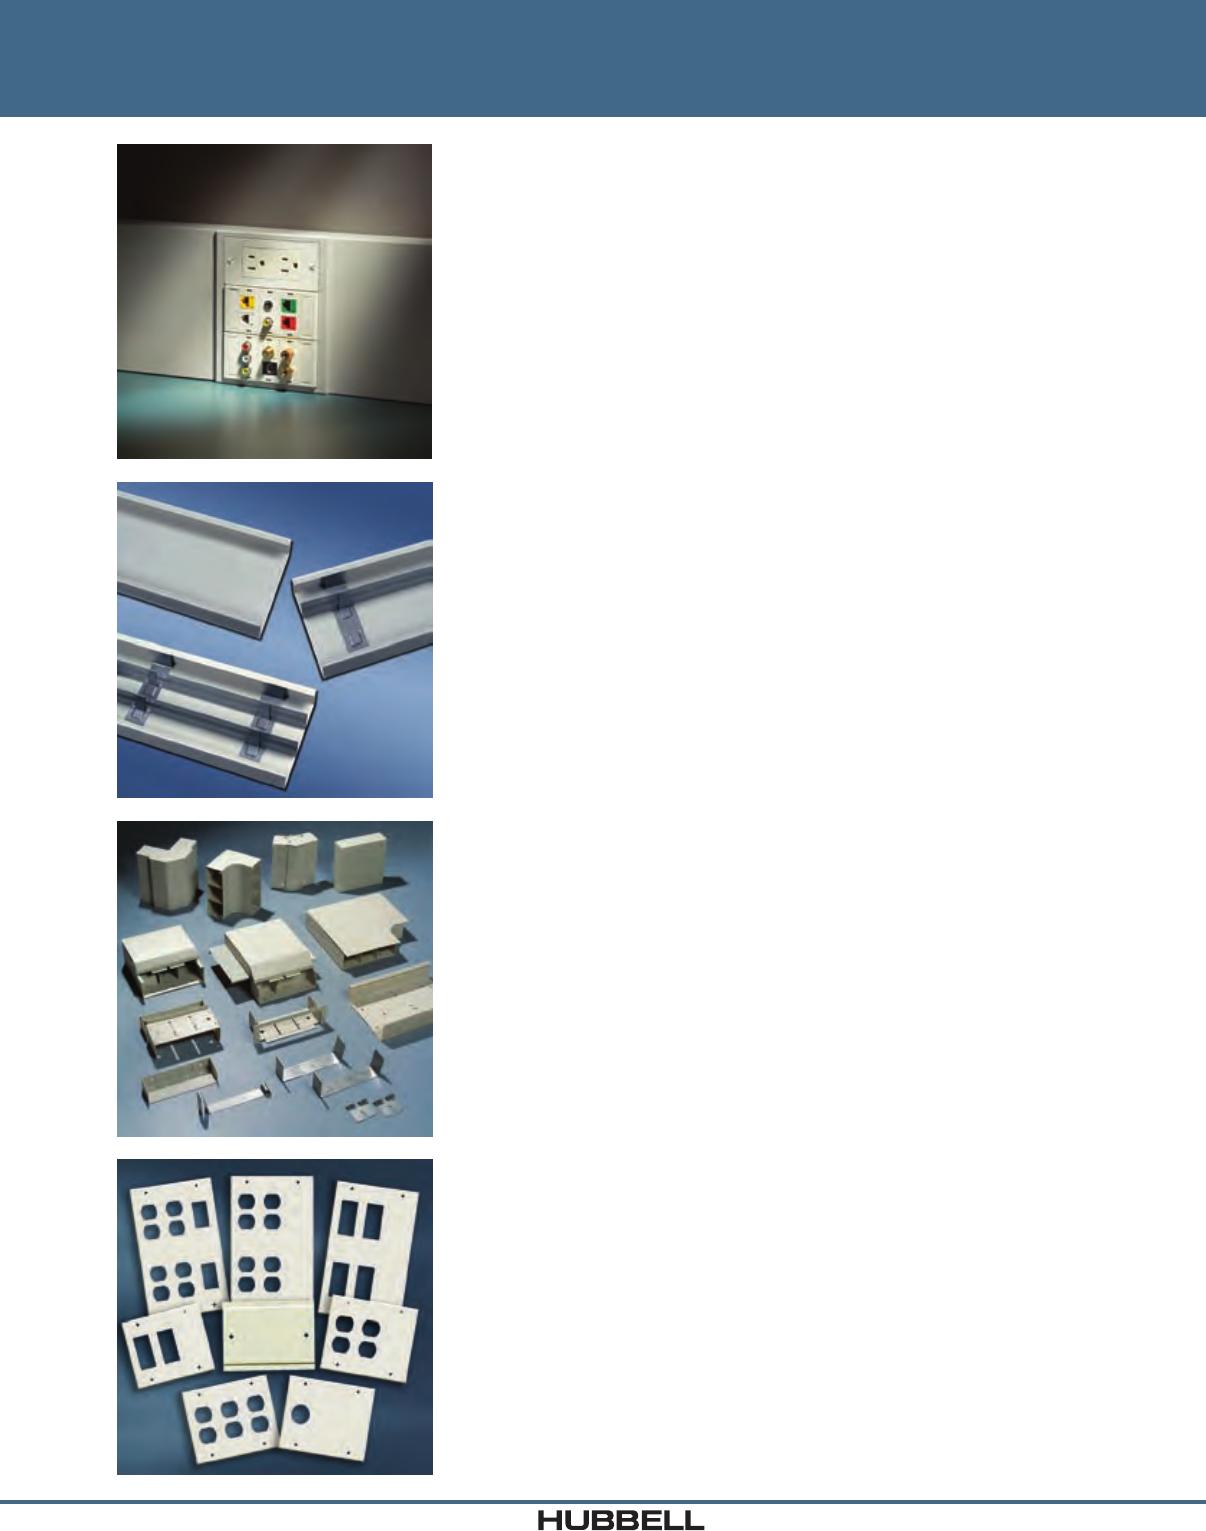 2-3-4 Length 1-5//8 Cutting Length 0.1770 Cutting Diameter SGS 57151 101 Slow Spiral Drills Aluminum Titanium Nitride Coating